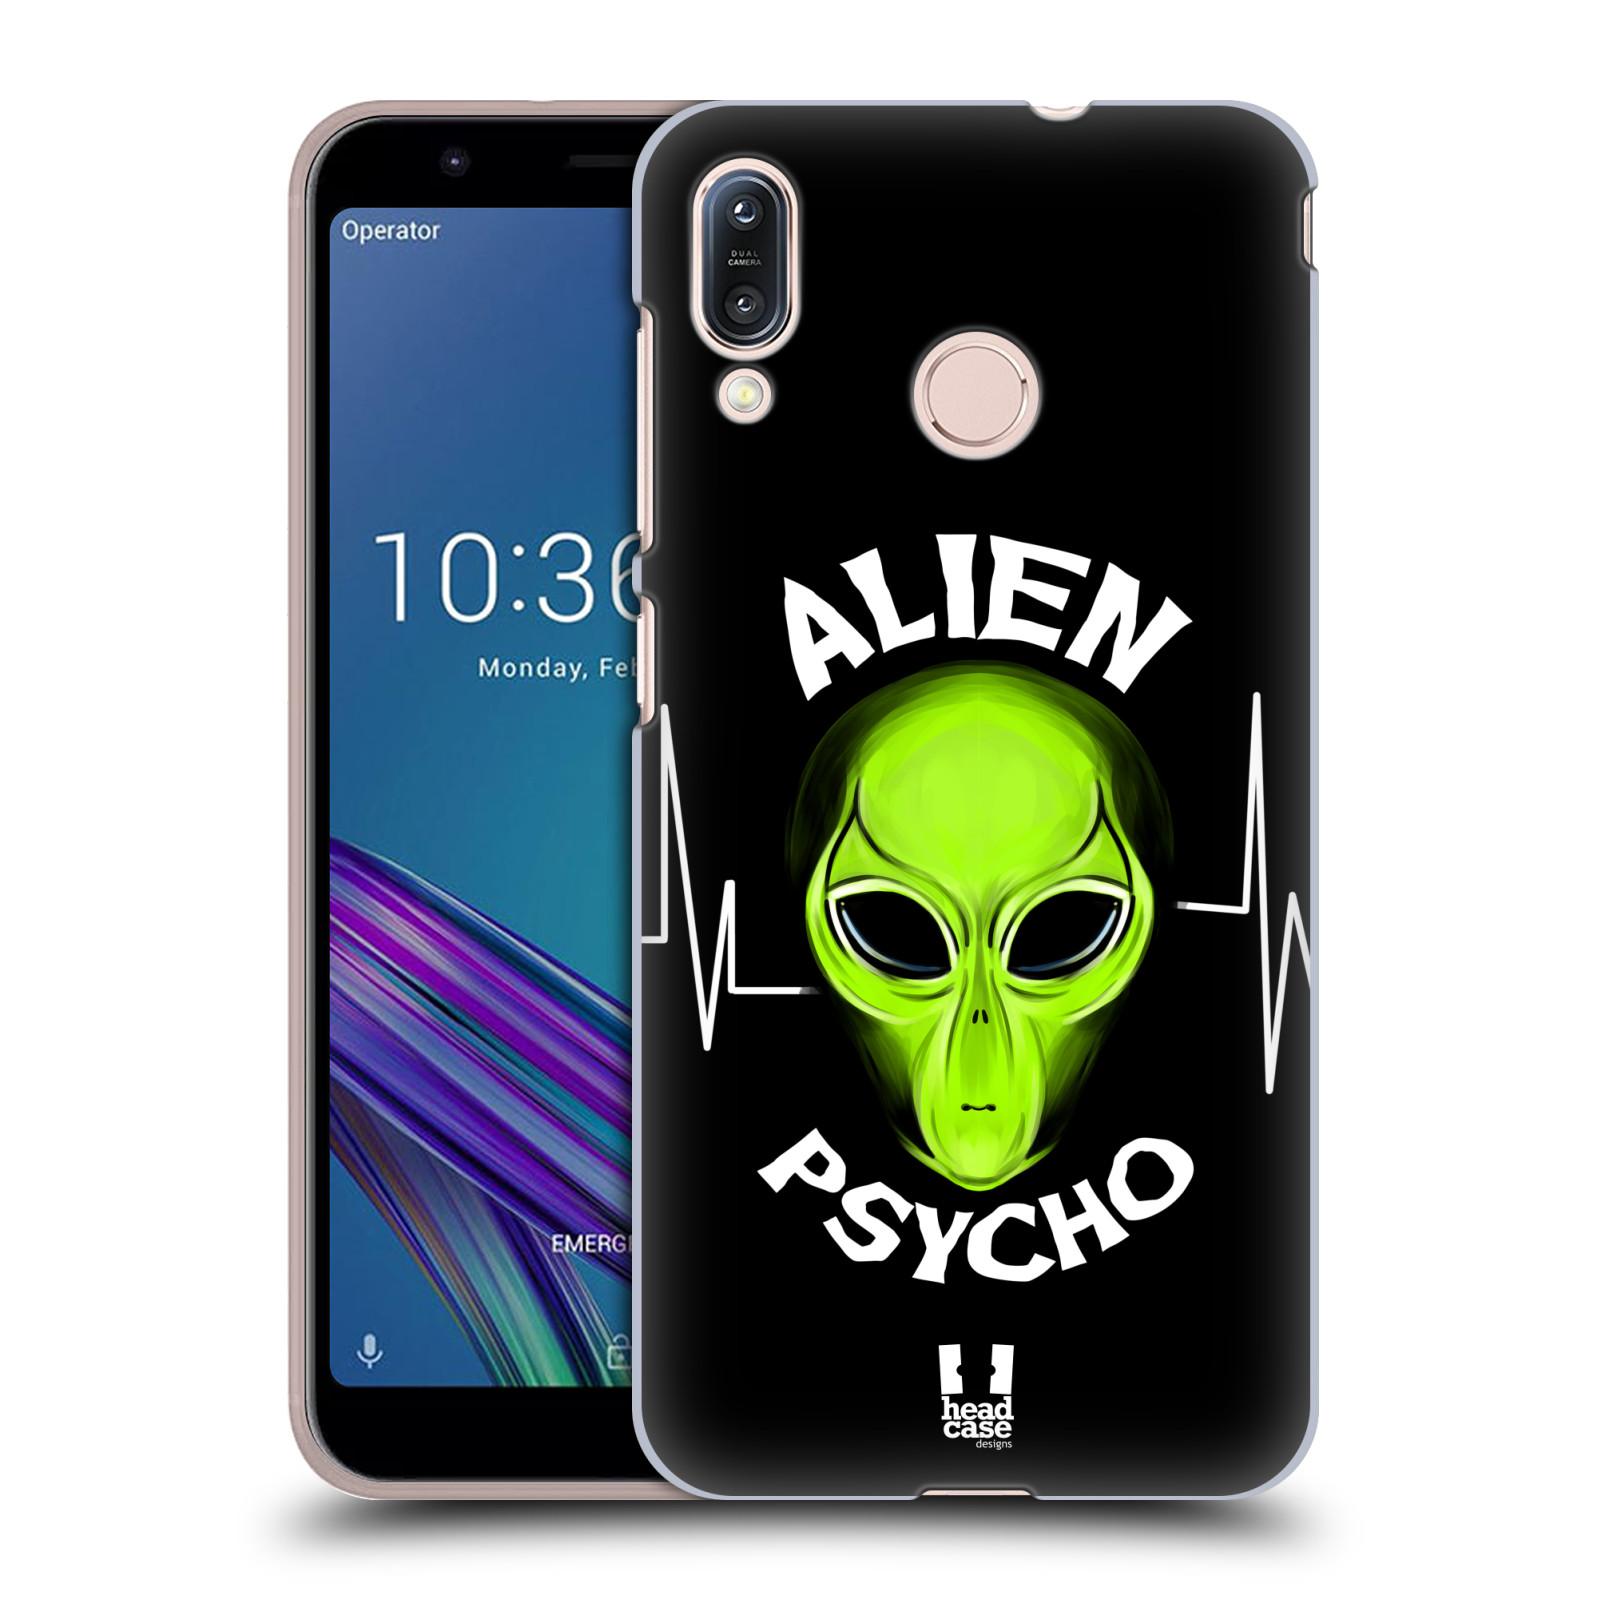 Plastové pouzdro na mobil Asus Zenfone Max M1 ZB555KL - Head Case - ALIENS PSYCHO